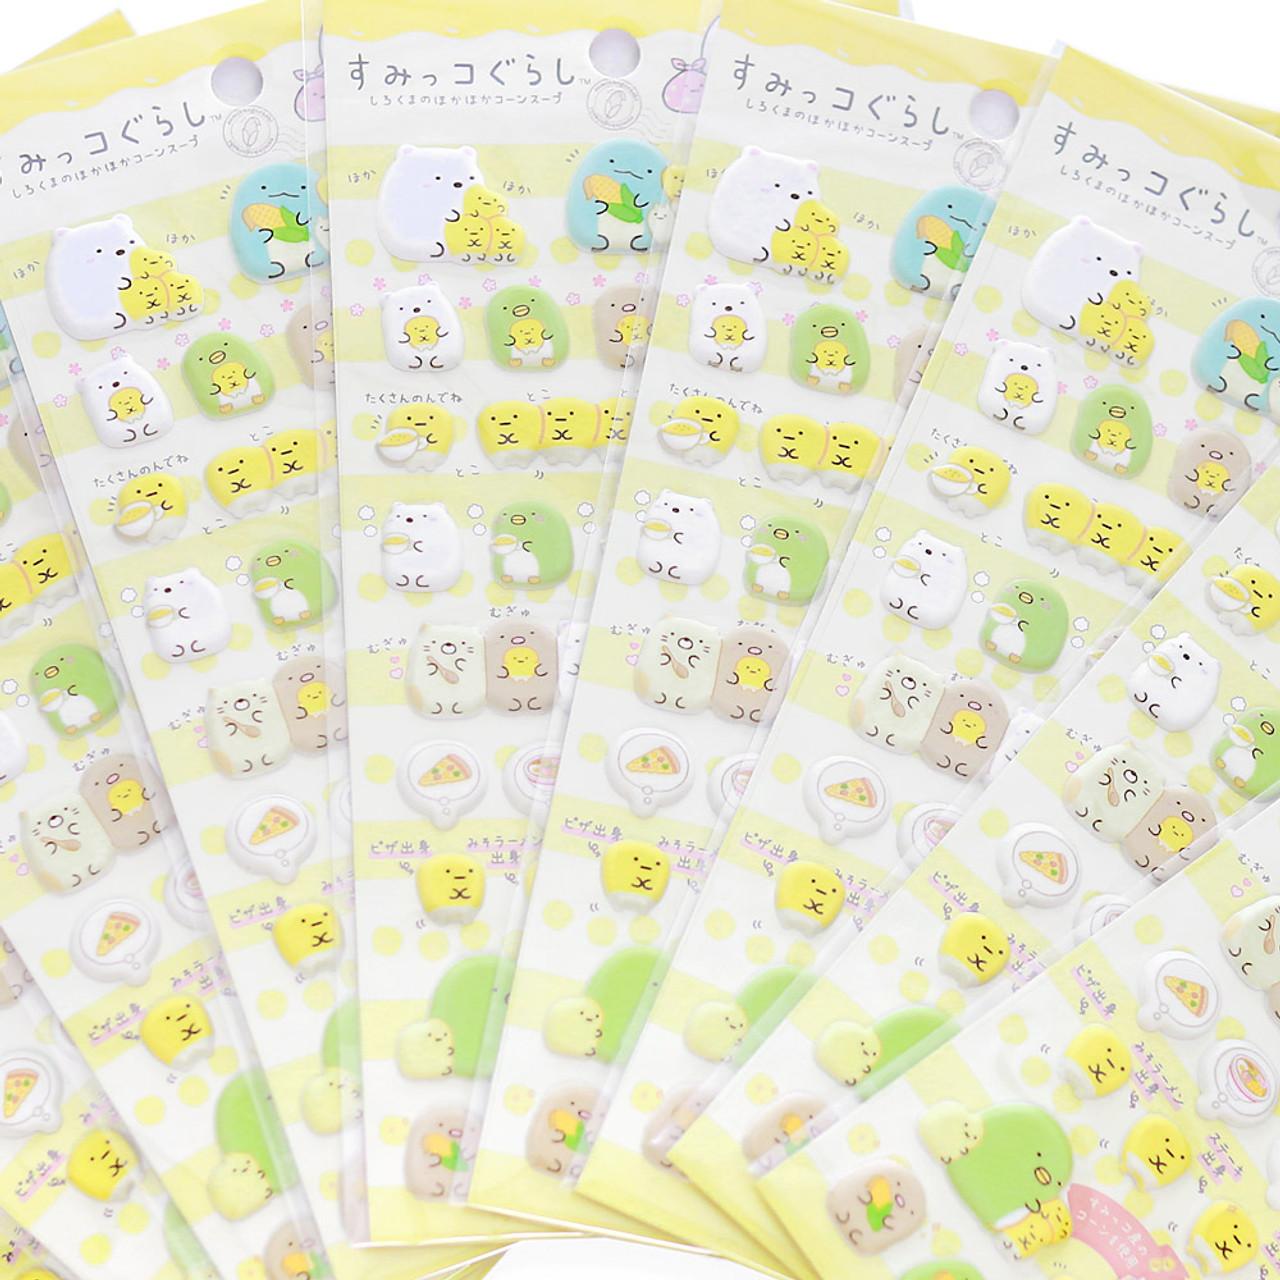 Sumikko Gurashi Funny Collection Sticker SE49201 - Corn ( Close-up 02 )